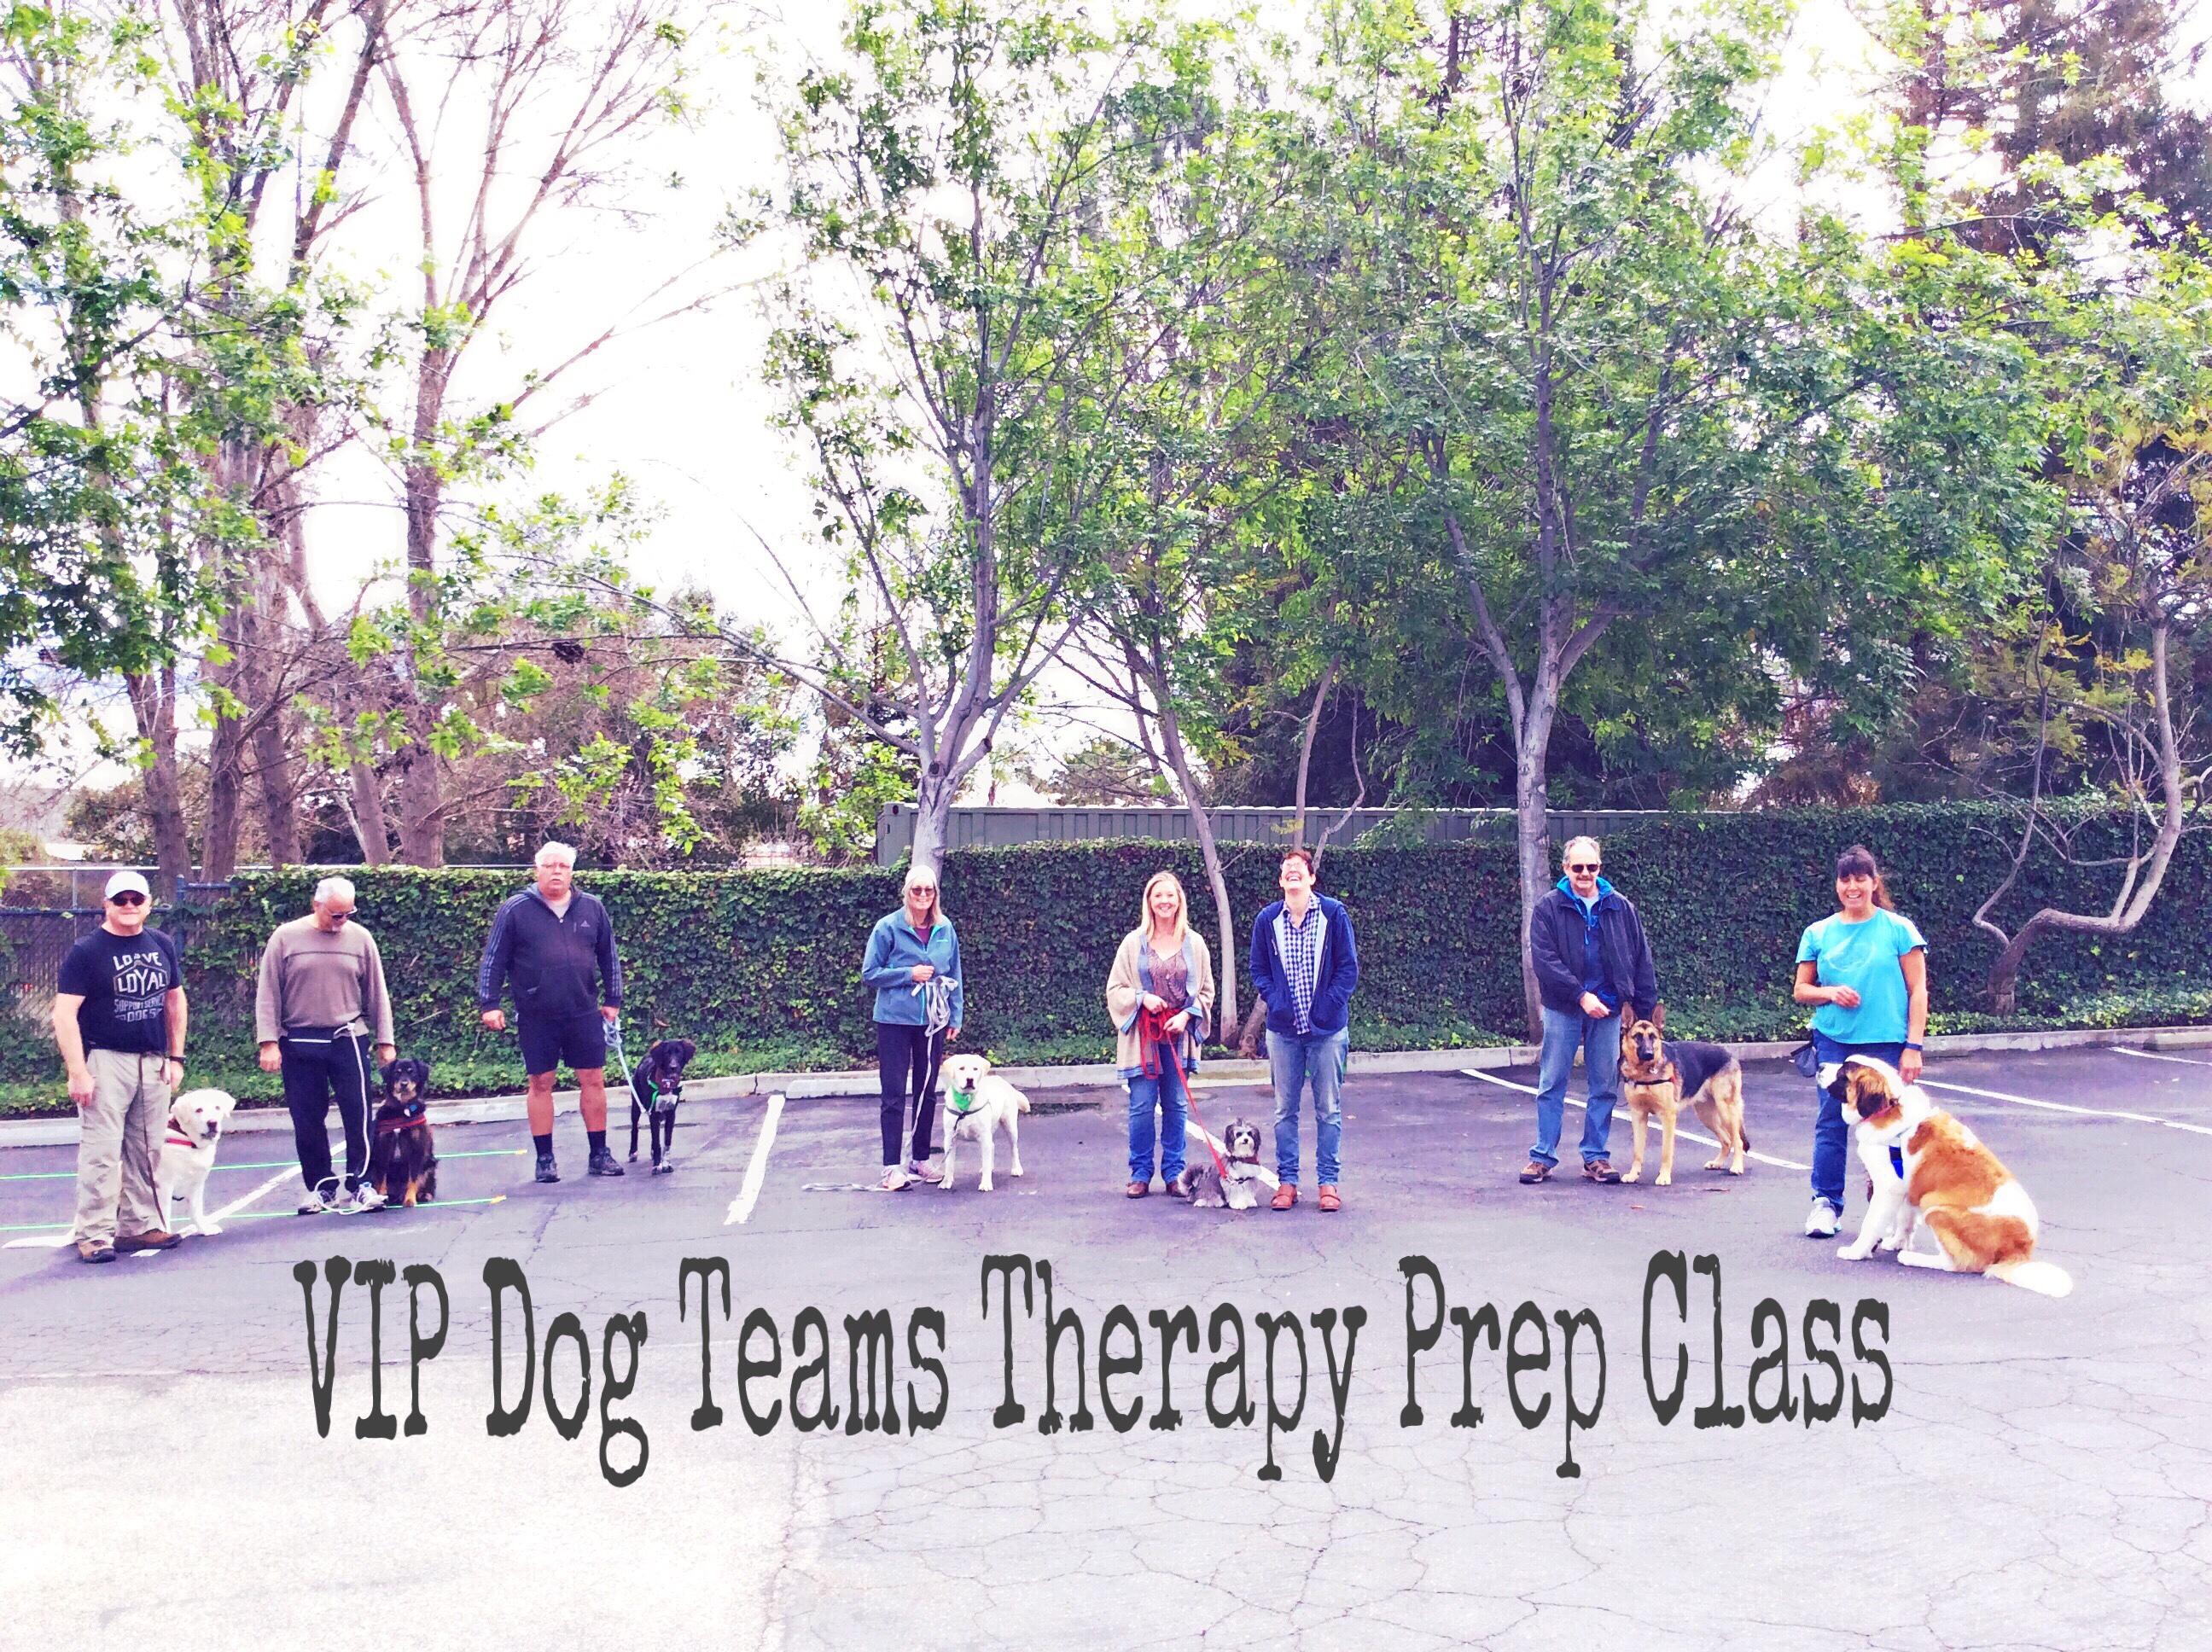 Therapy prep class